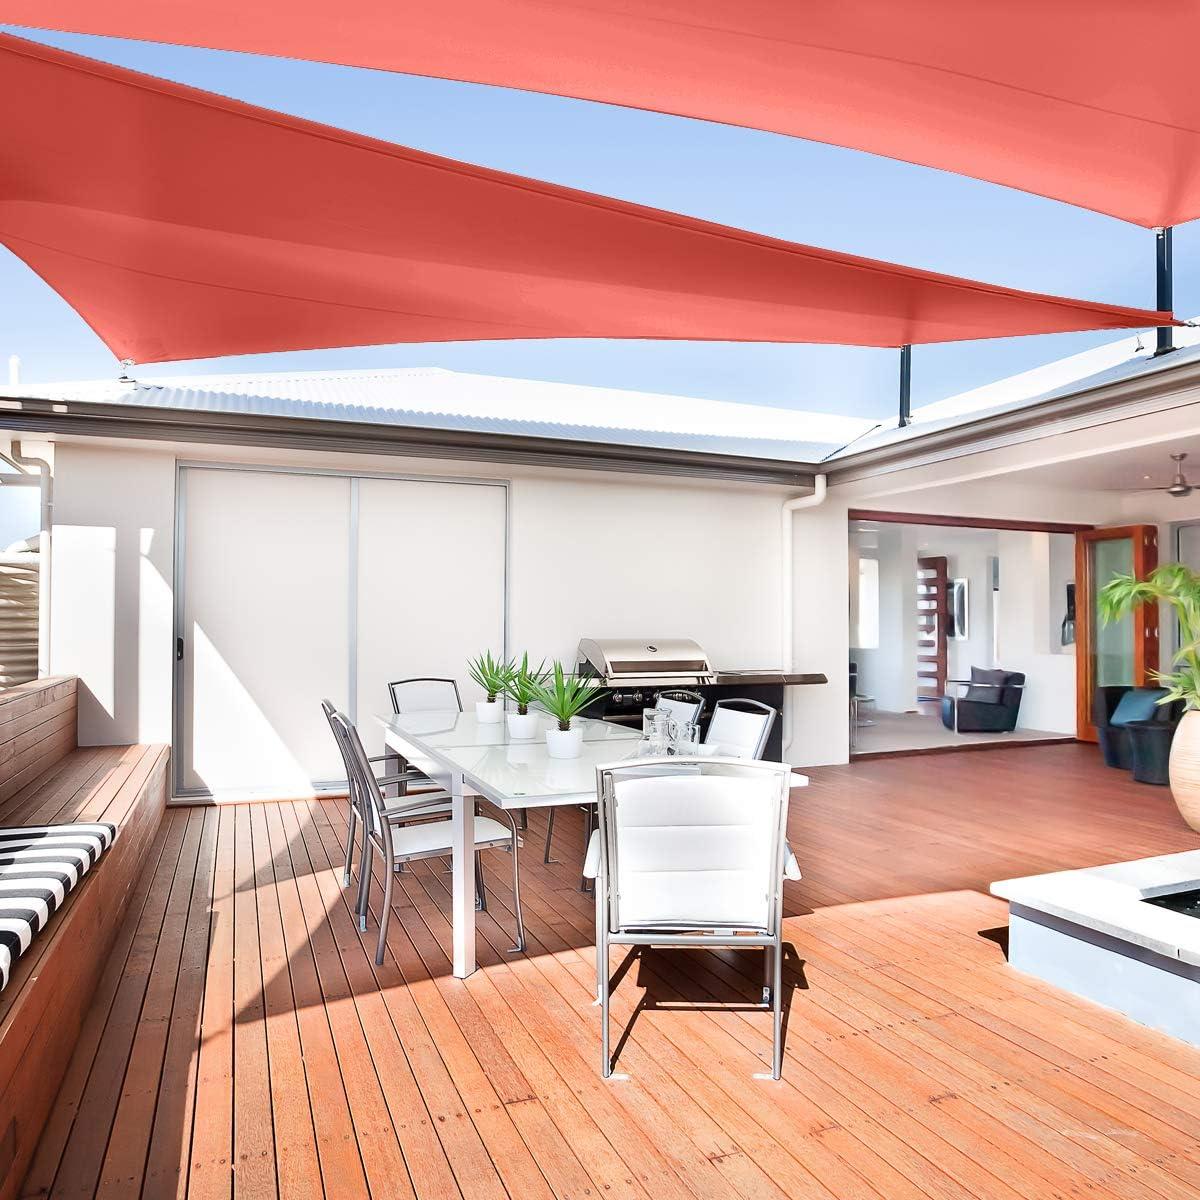 AsterOutdoor Triangle 10 x 10 x 10 Sun Shade Sail Canopy UV Block for Patio Yard Lawn Garden Outdoor Activities Cream